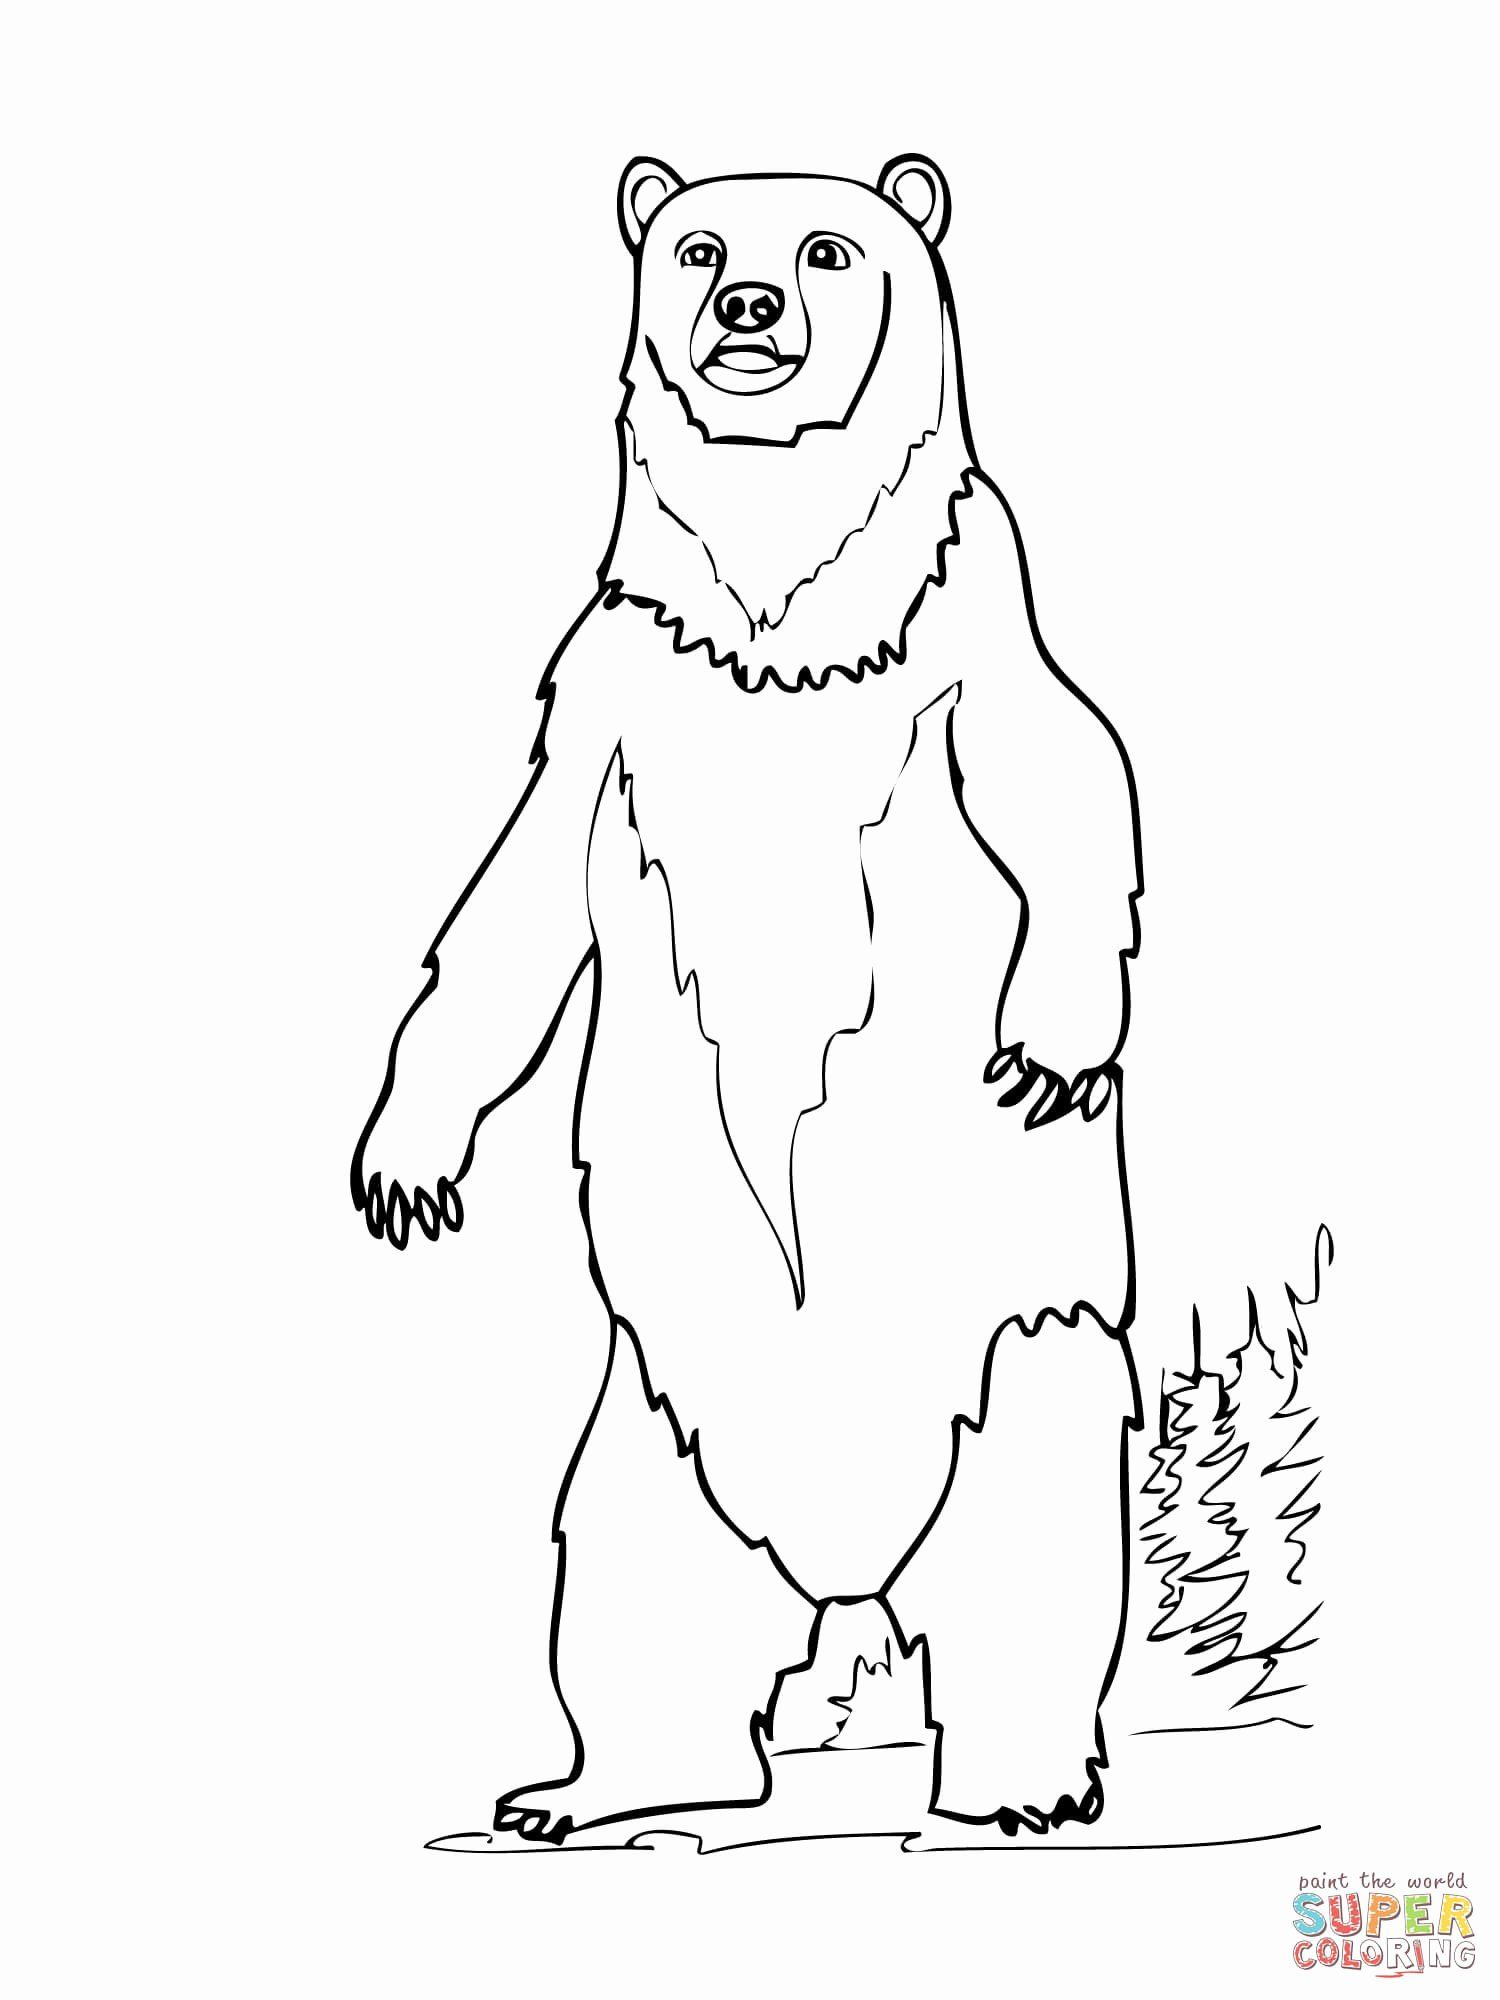 Brown Bear Coloring Page Elegant Brown Bear Printables Coloring Home Coloriage Ours Ours A Colorier Coloriage A Imprimer Gratuit